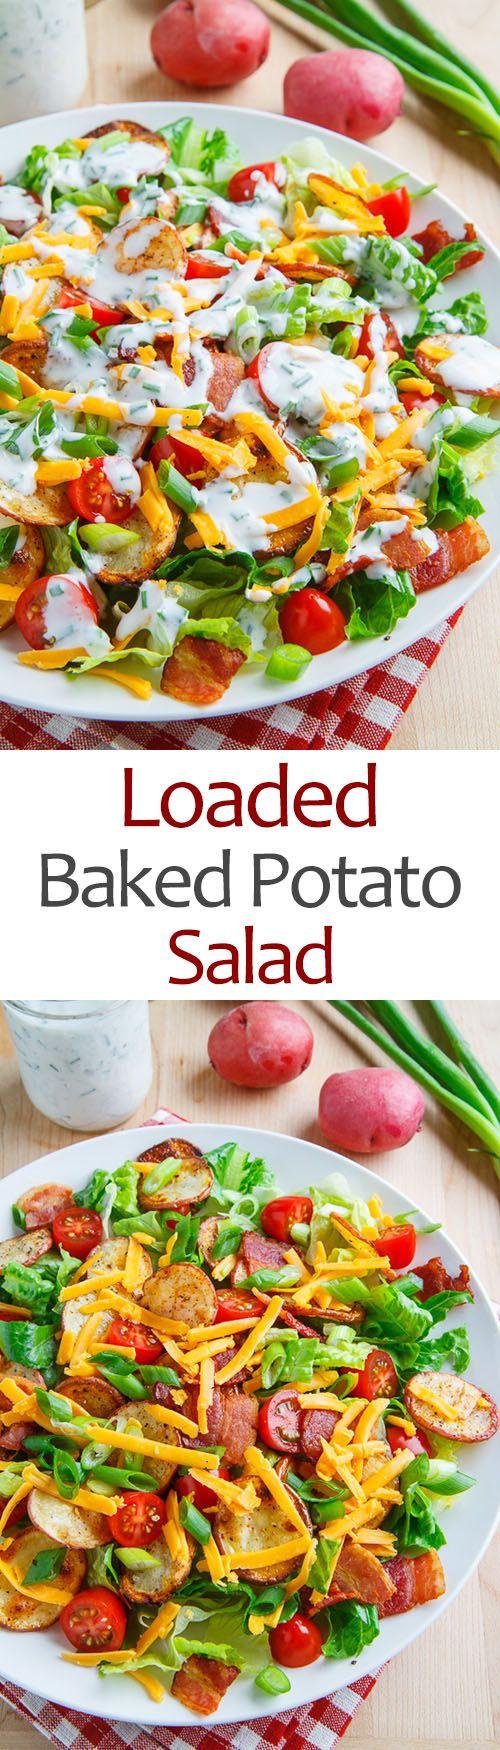 Loaded Baked Potato Salad                                                                                                                                                     More